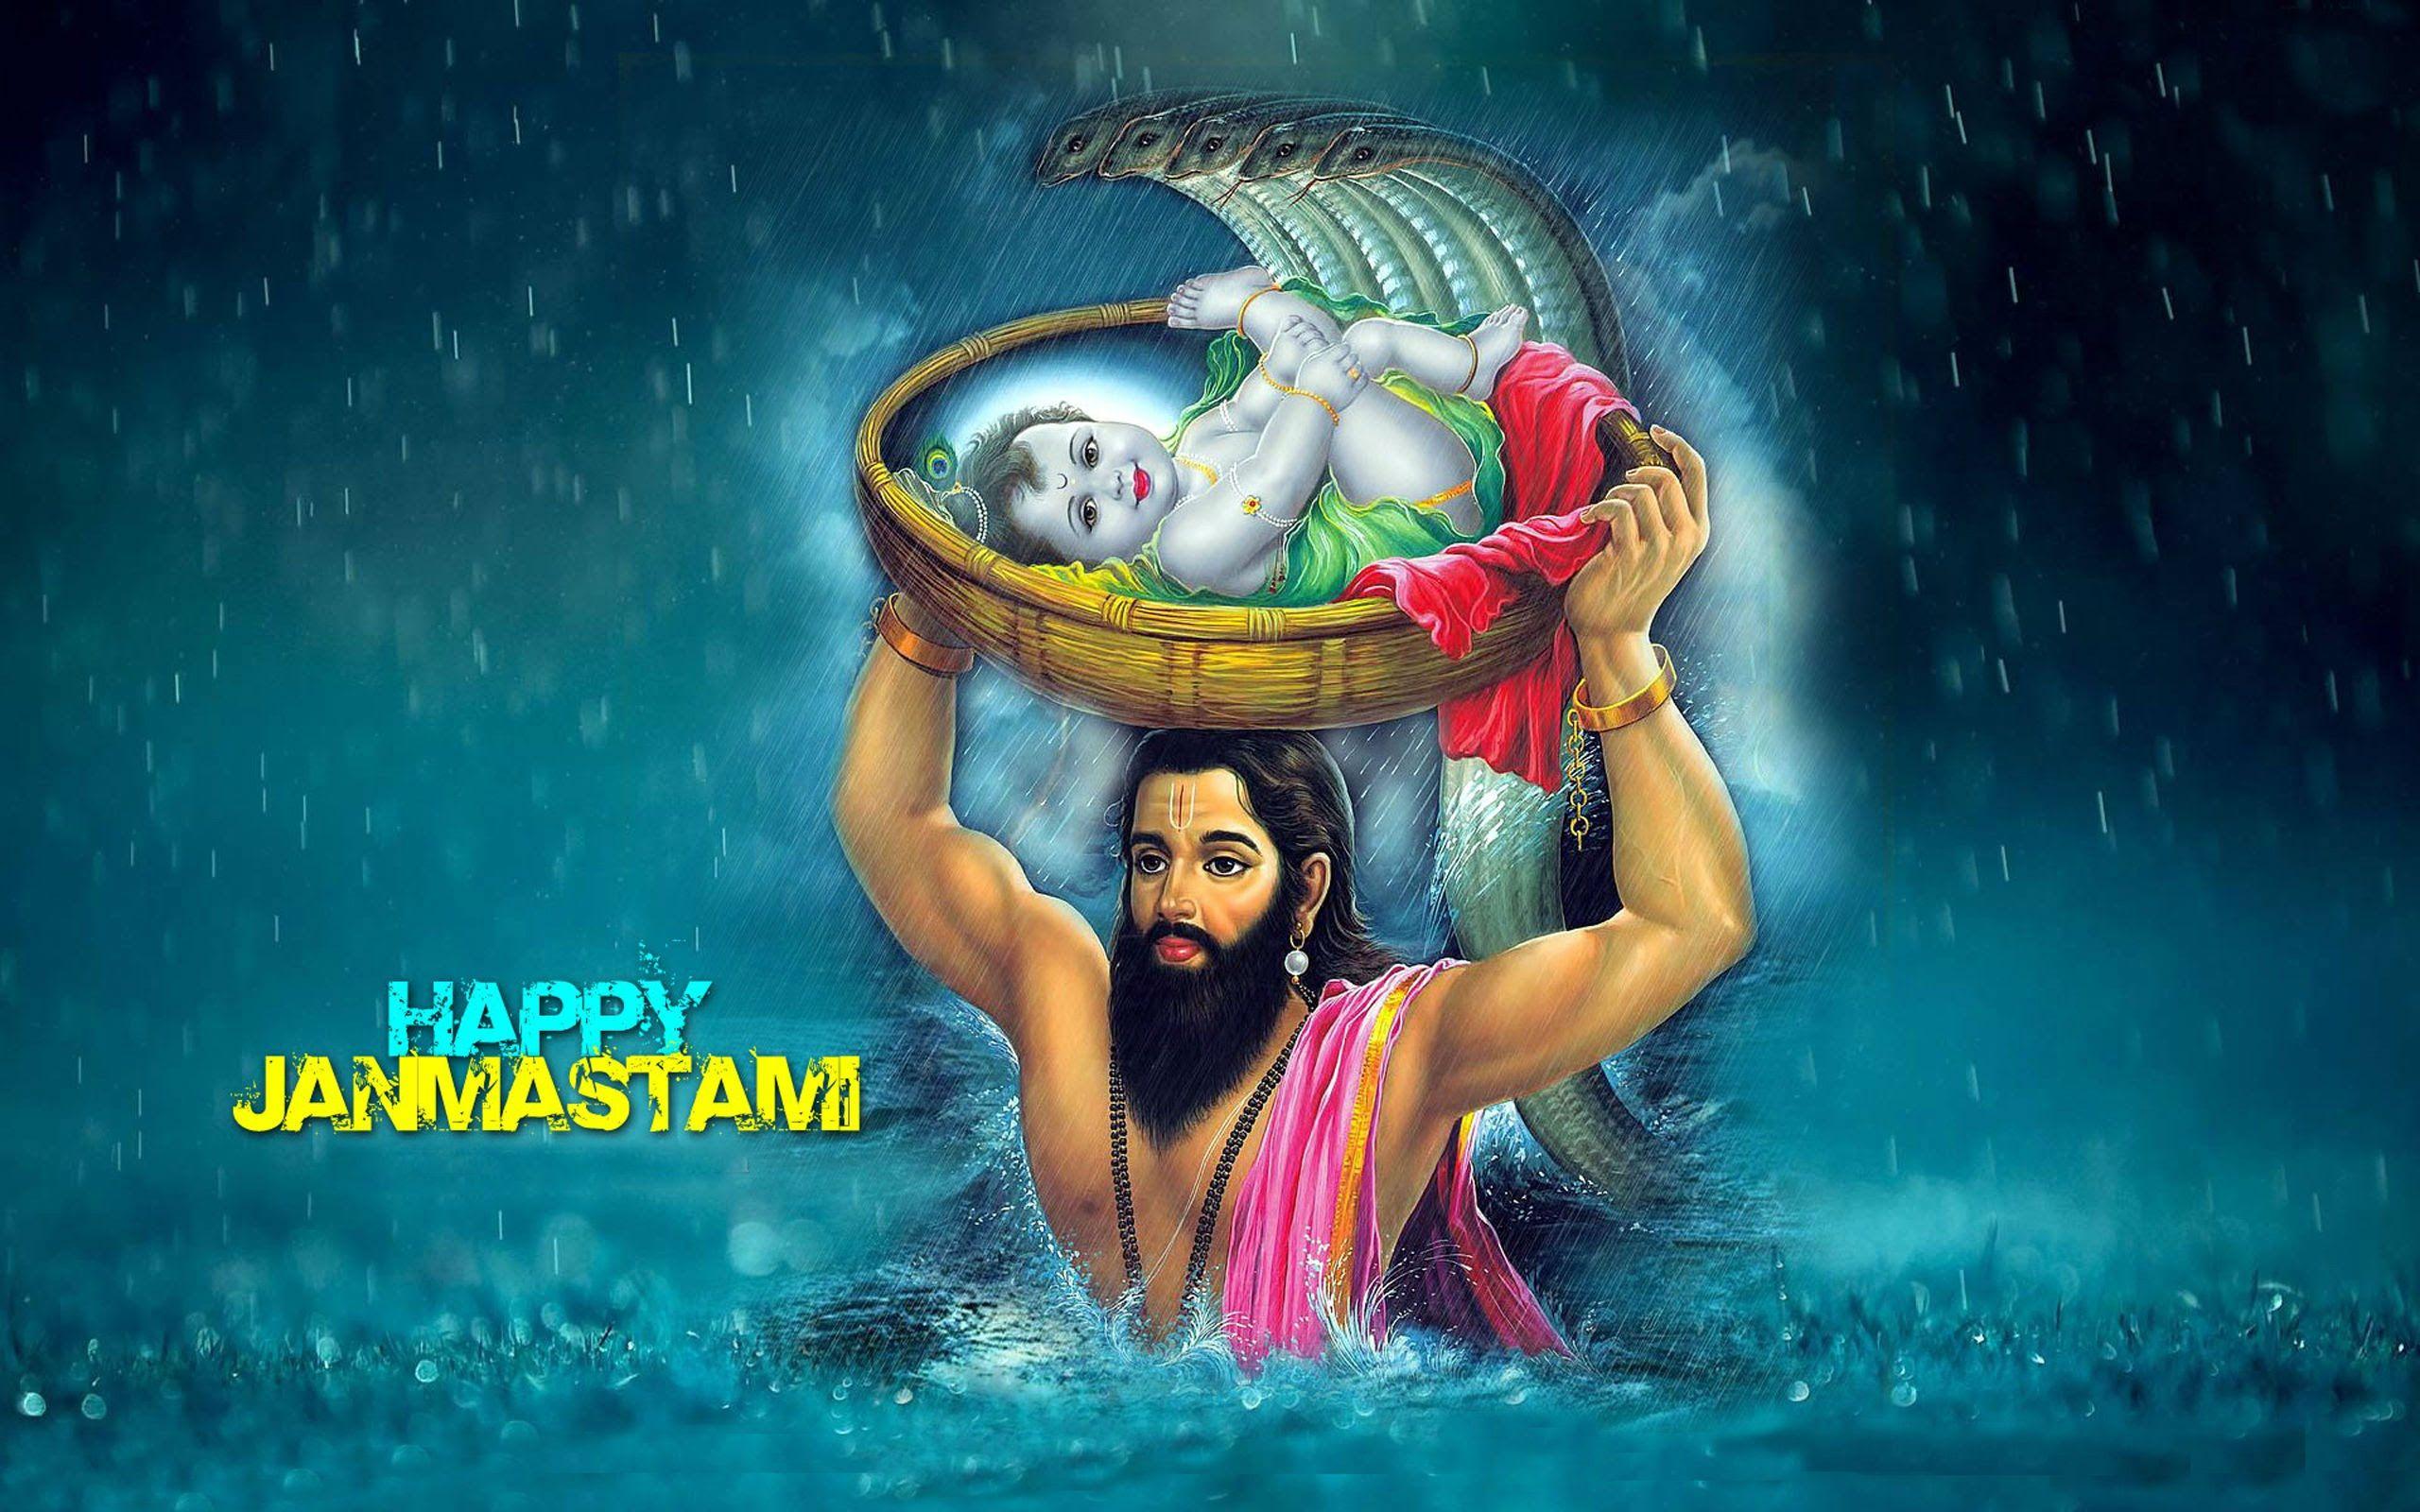 Pin By Swarna Fasteners On Gernal Happy Janmashtami Image Happy Janmashtami Janmashtami Wishes